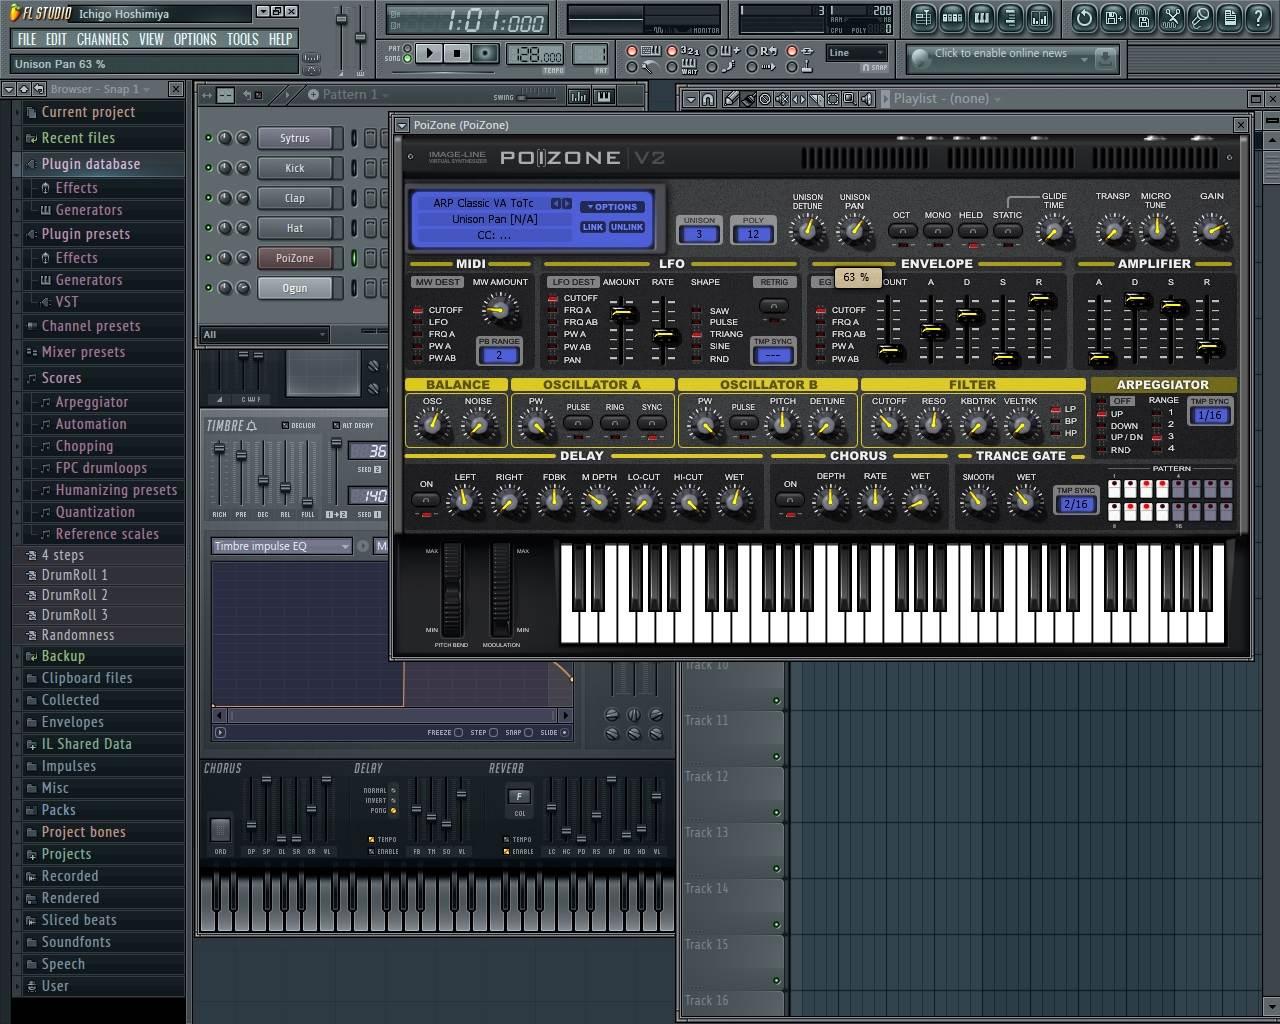 fl studio producer edition 12.4 2 keygen